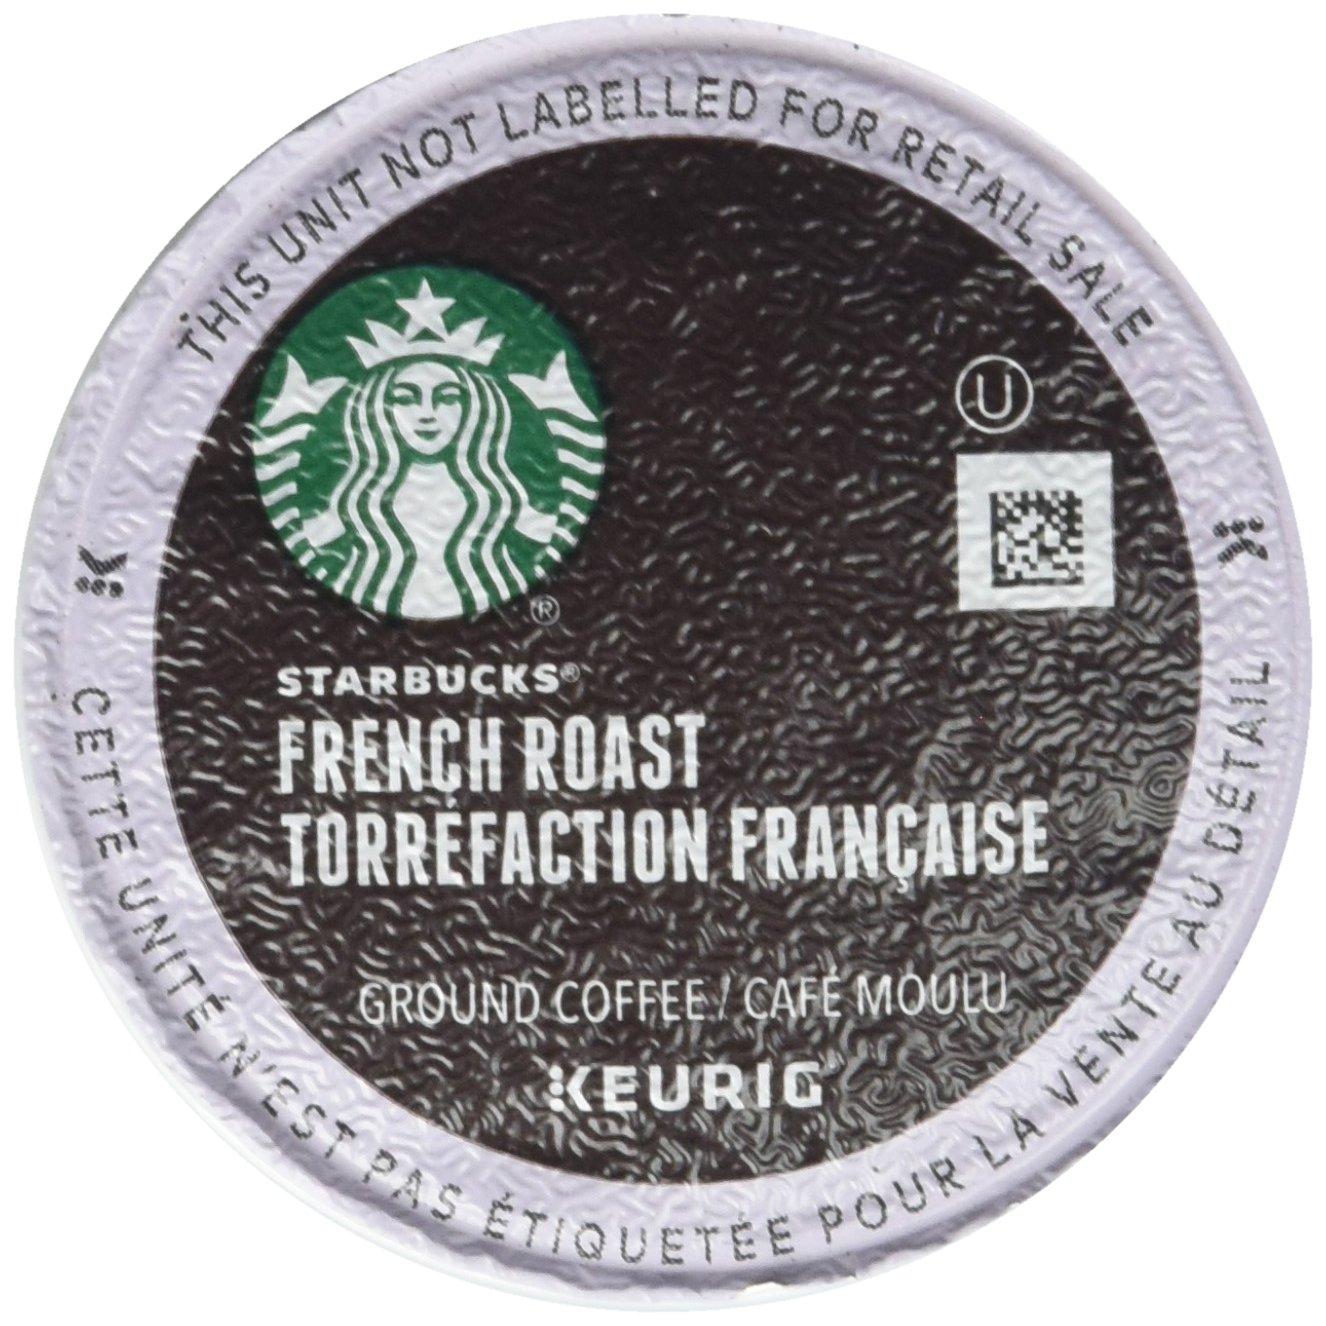 Starbucks French Roast Dark Coffee K-Cups